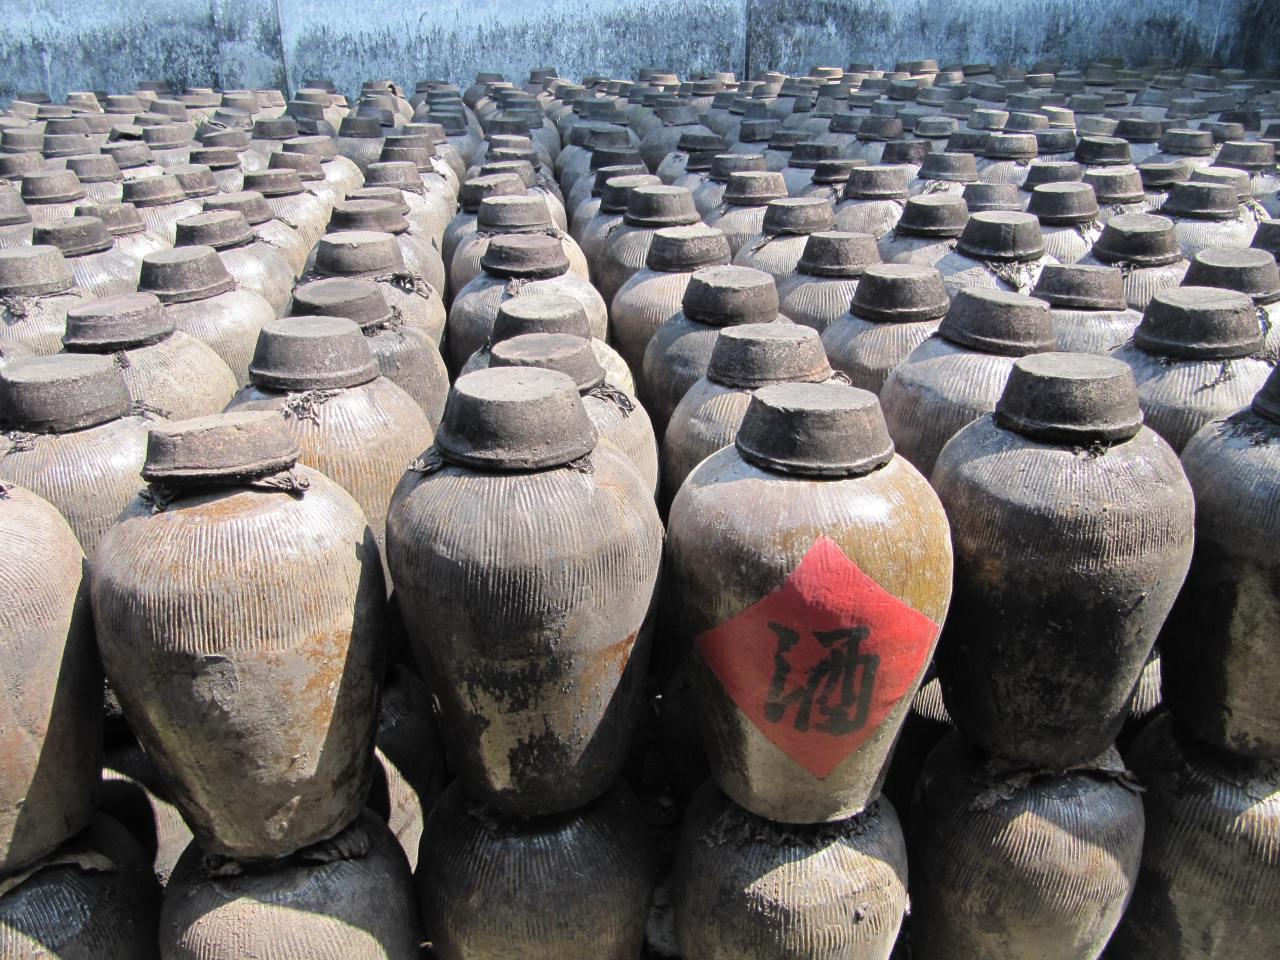 Chiny, Wuzhen, podróże po Chinach